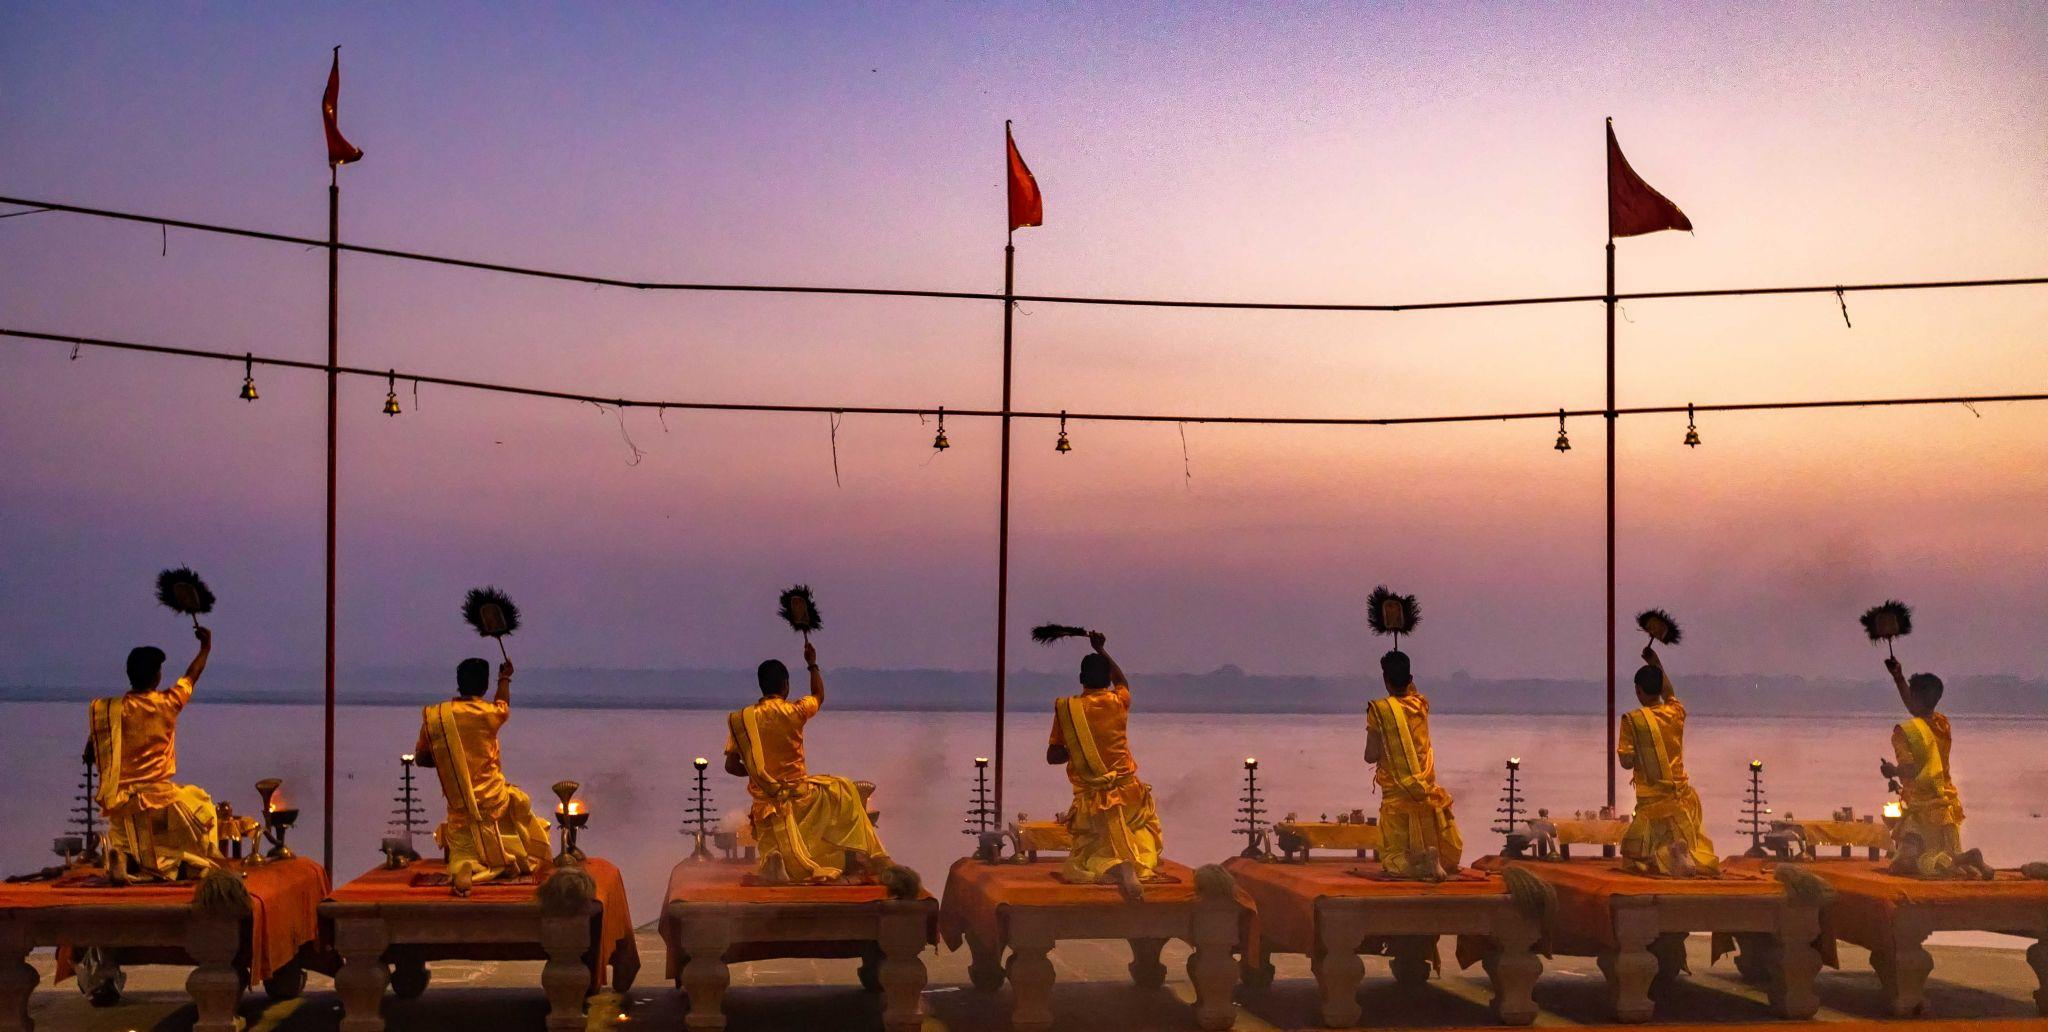 Aarti Hindu Religious Ritual ,The Ganges, Varanasi, India